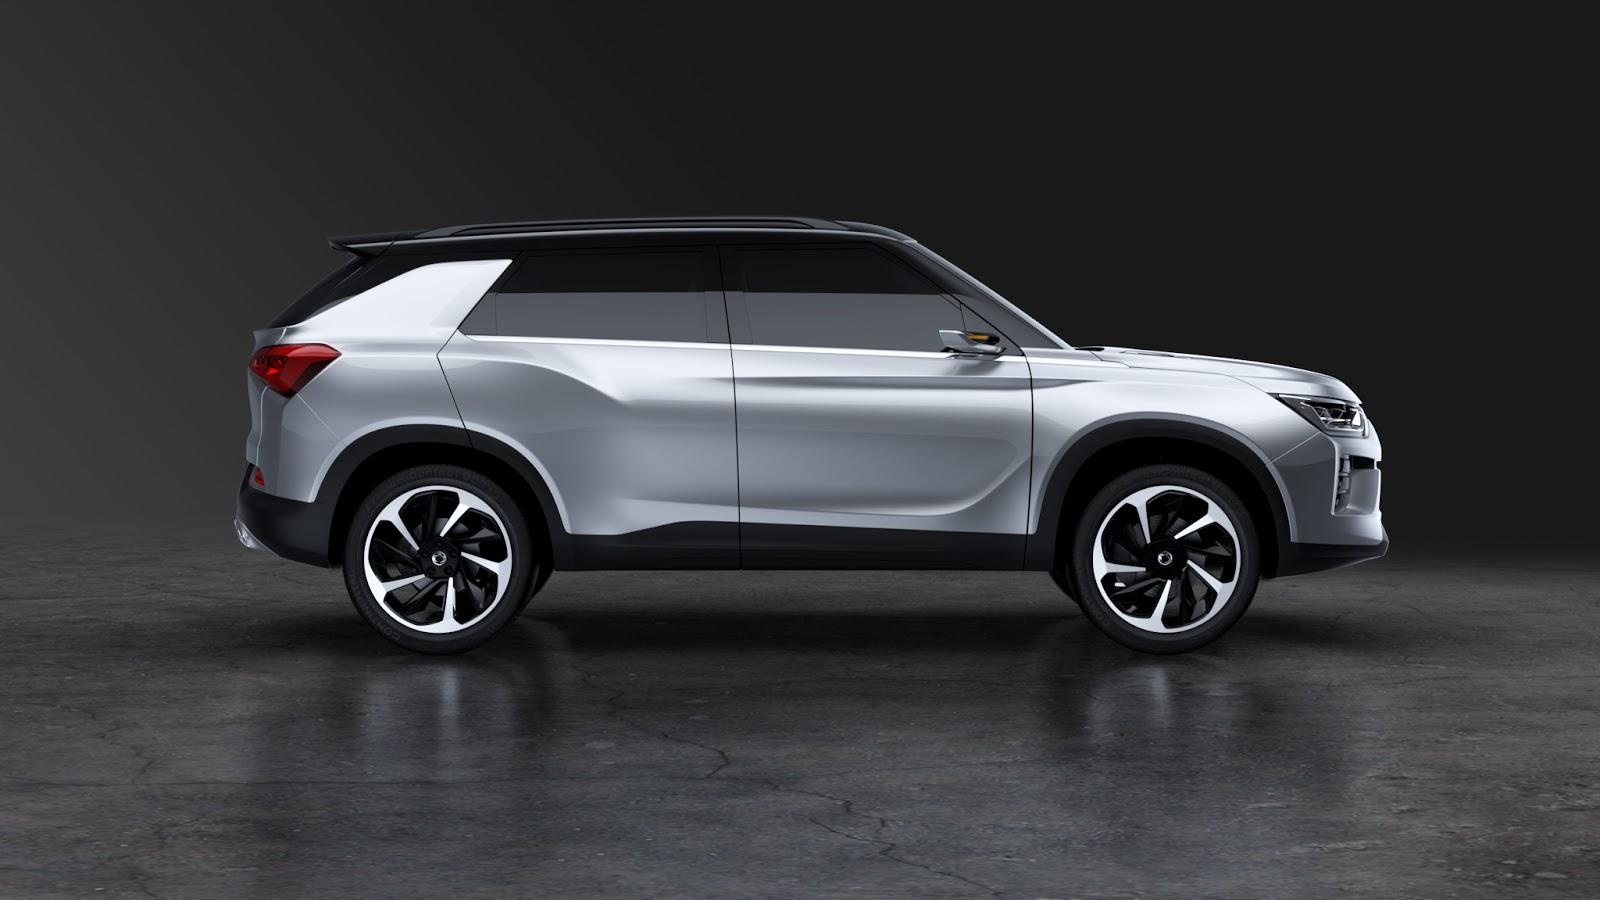 SIV 2%2B5 Η SSANGYONG παρουσιάζει ένα μεσαίο πολυχρηστικό SUV